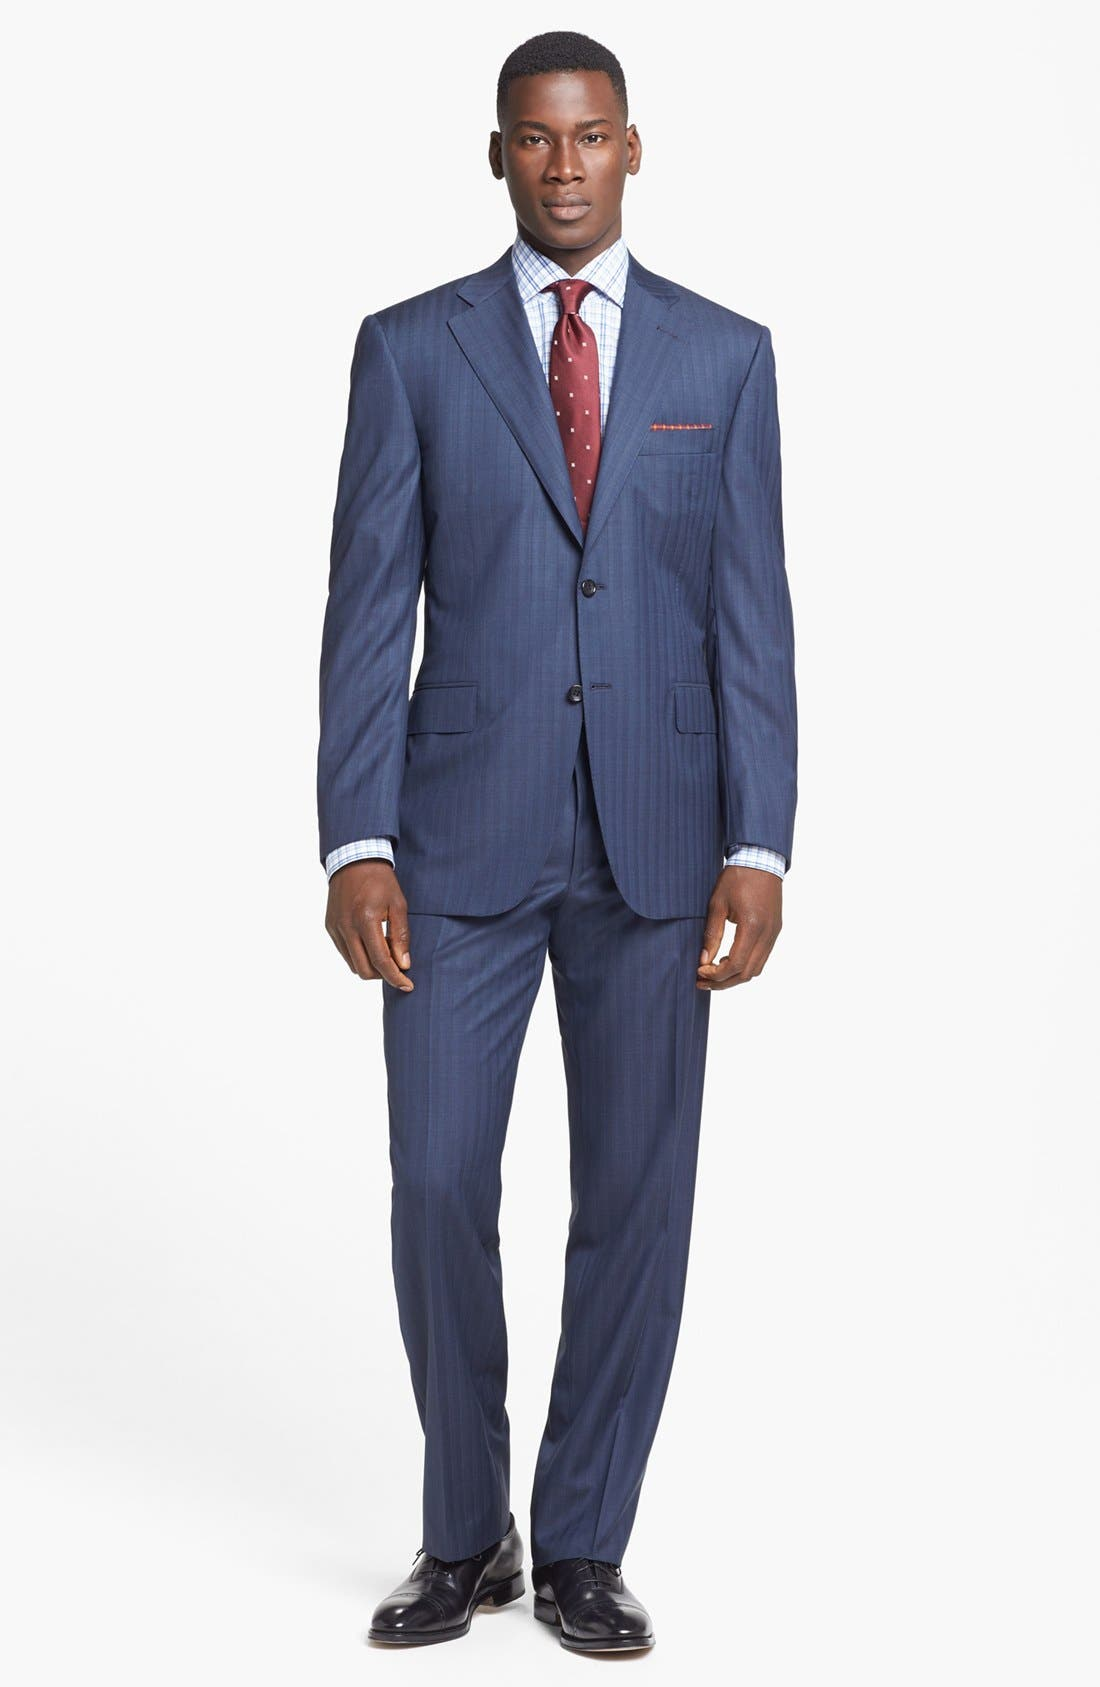 Alternate Image 1 Selected - Canali Suit & BOSS HUGO BOSS Dress Shirt